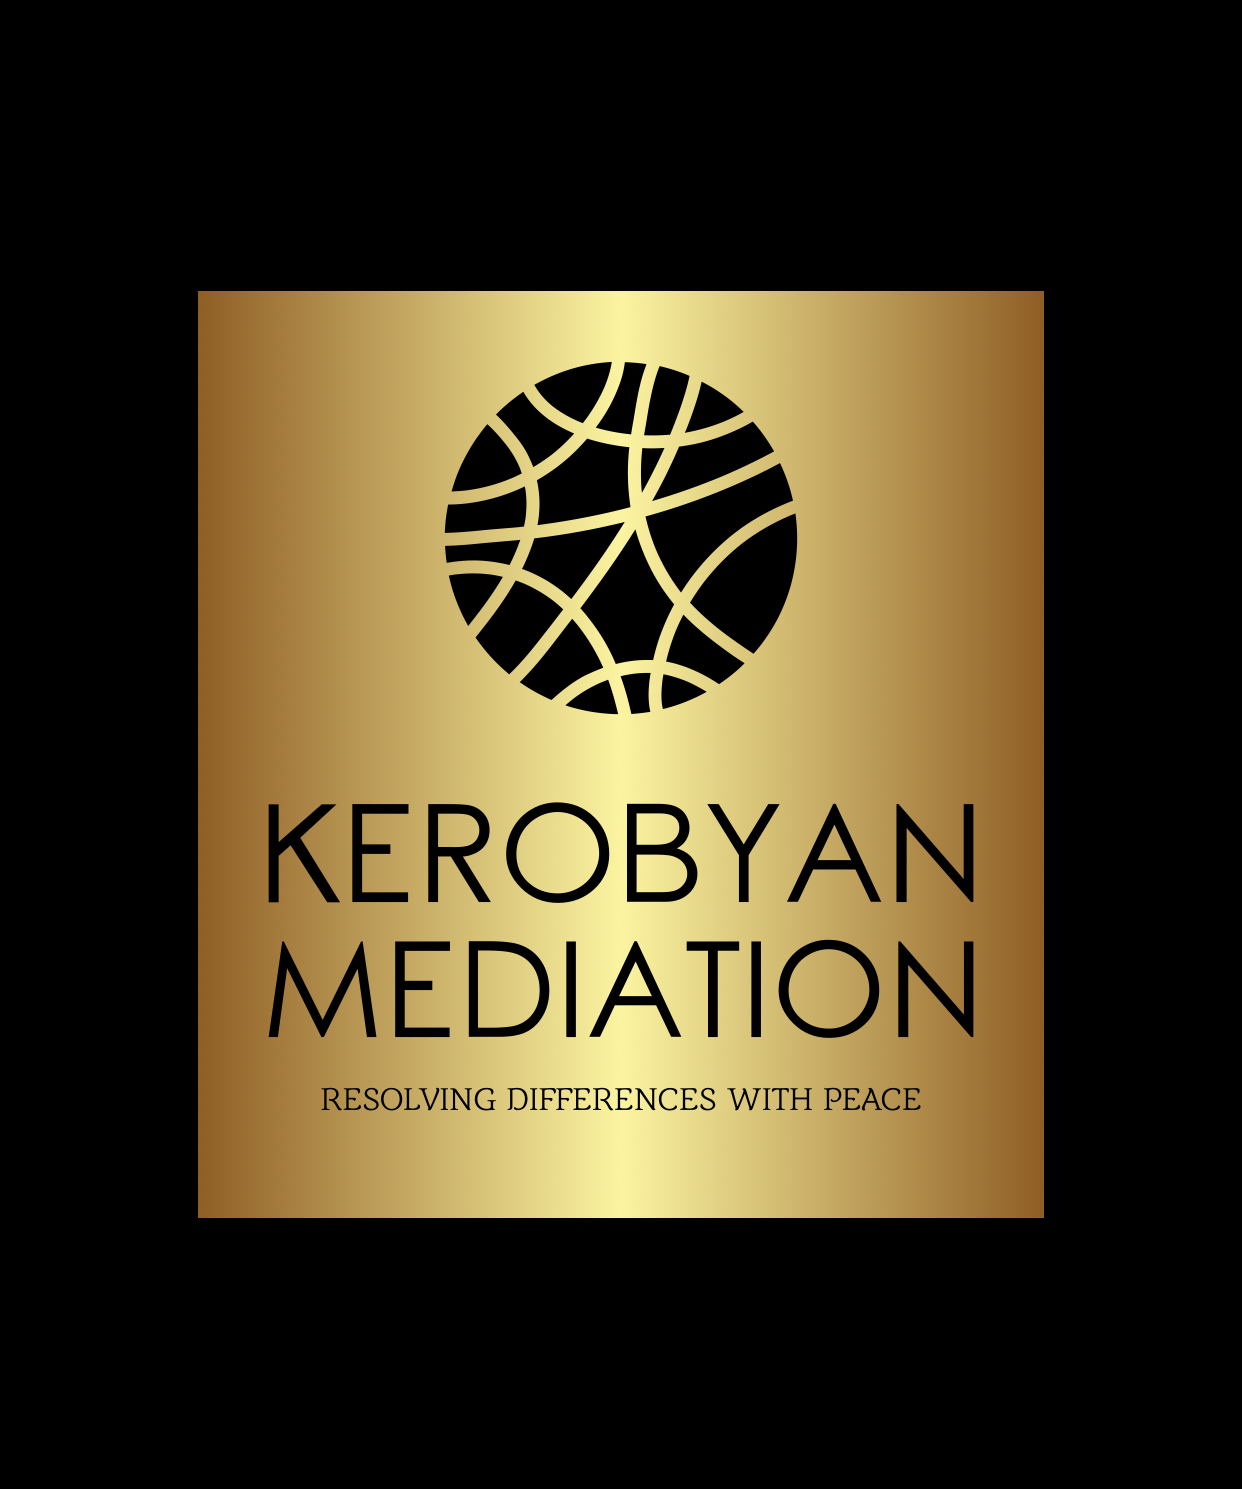 Why Arbitration — Kerobyan Mediation